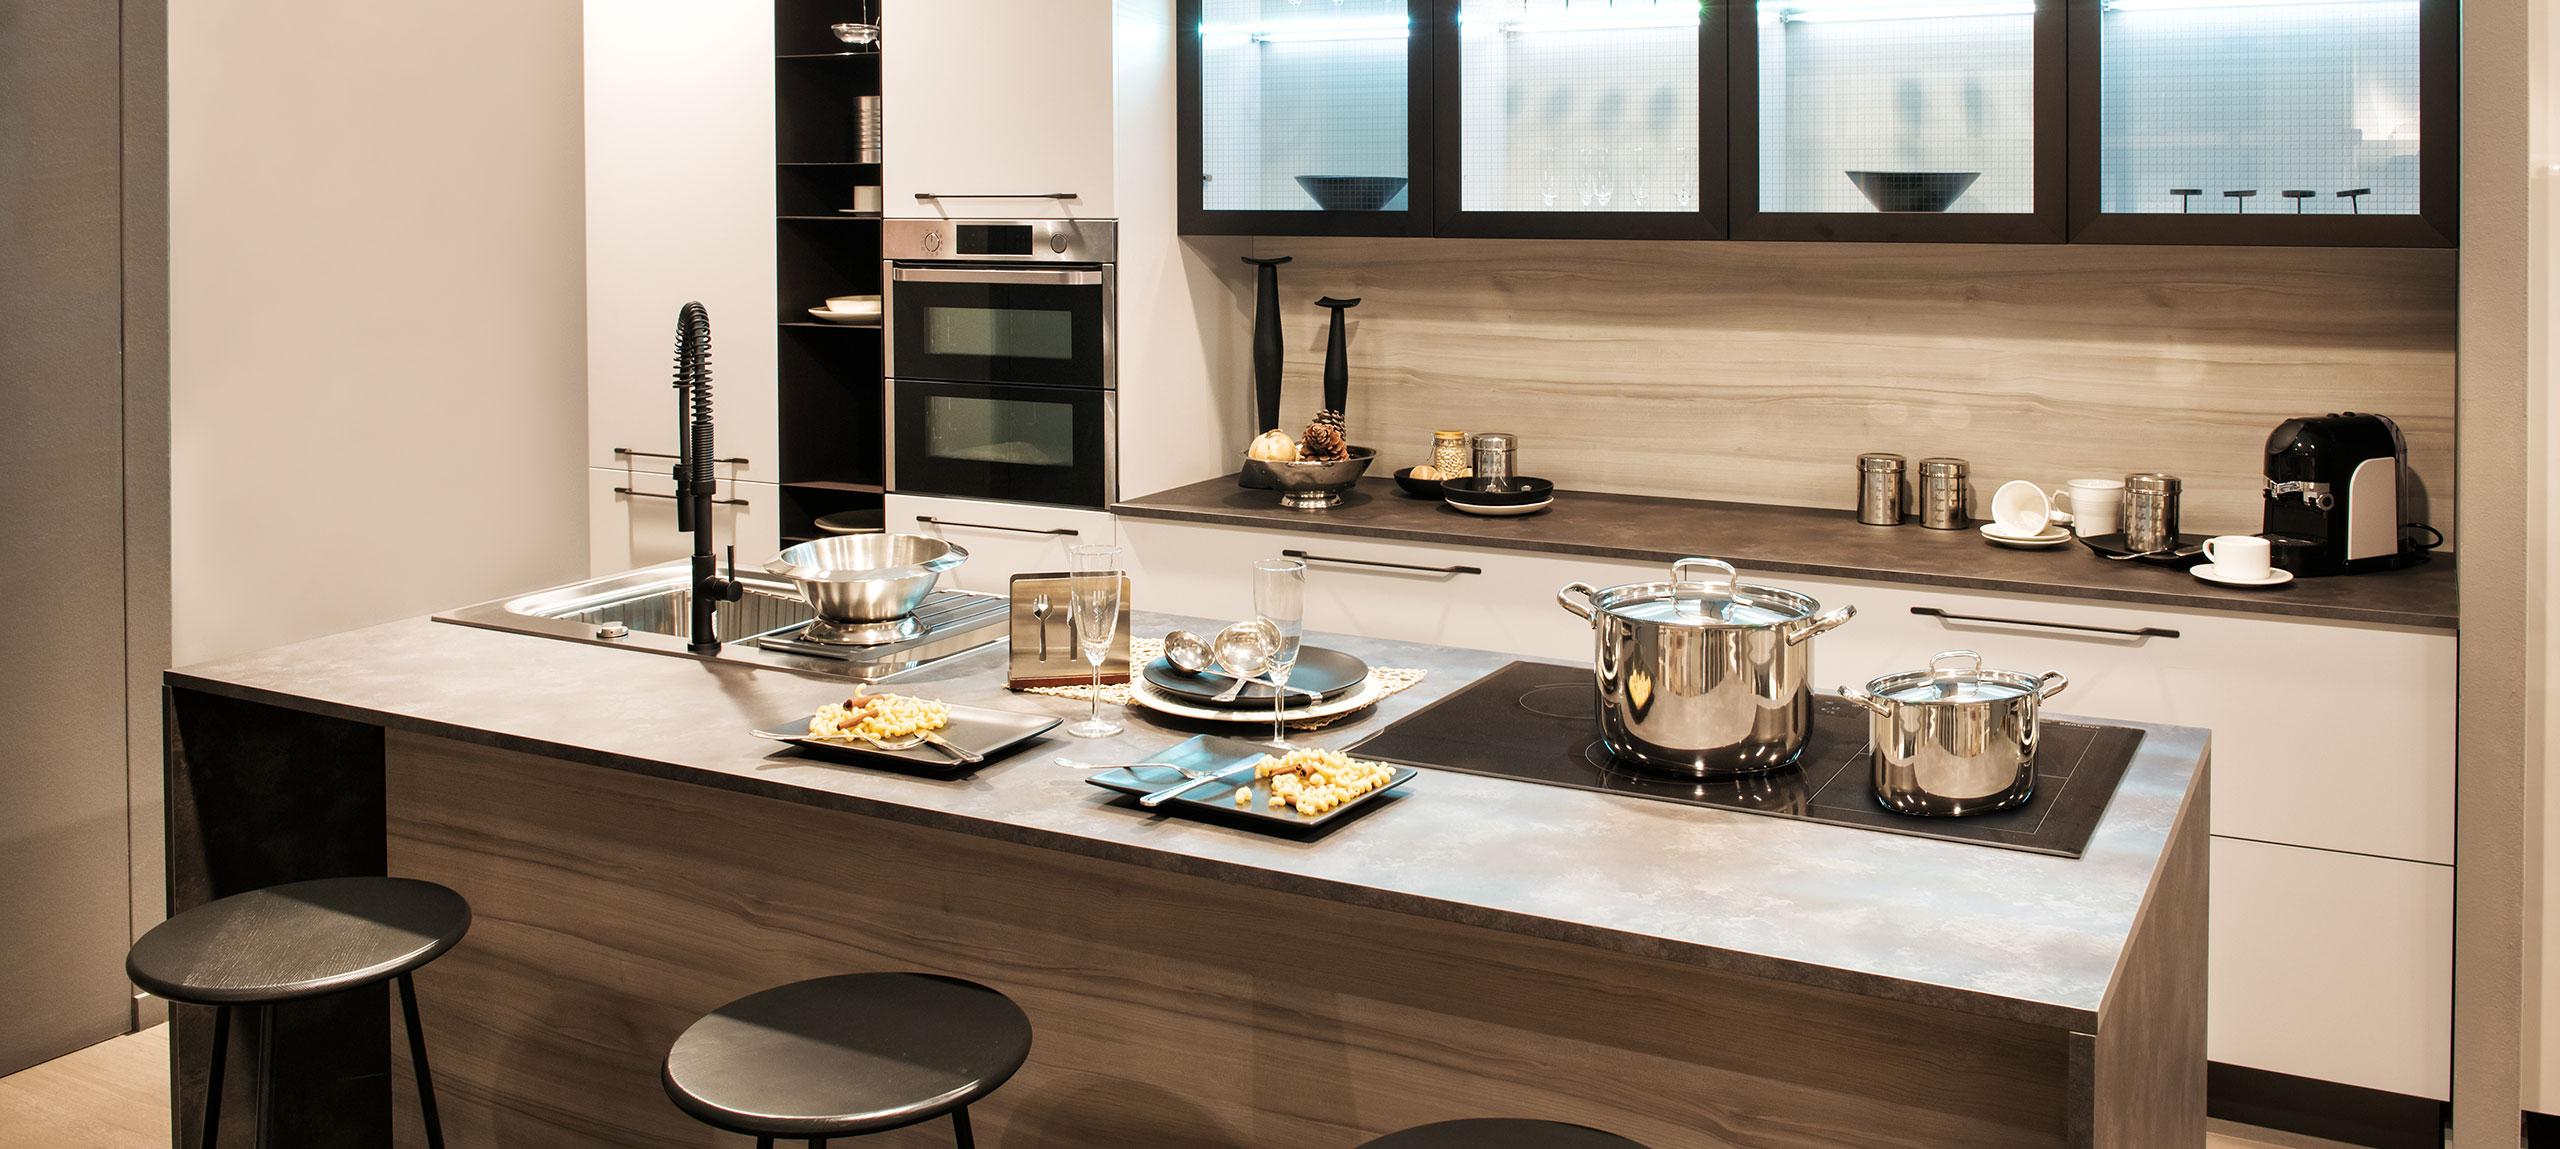 TasteOverTime - Recipes Header - Kitchen